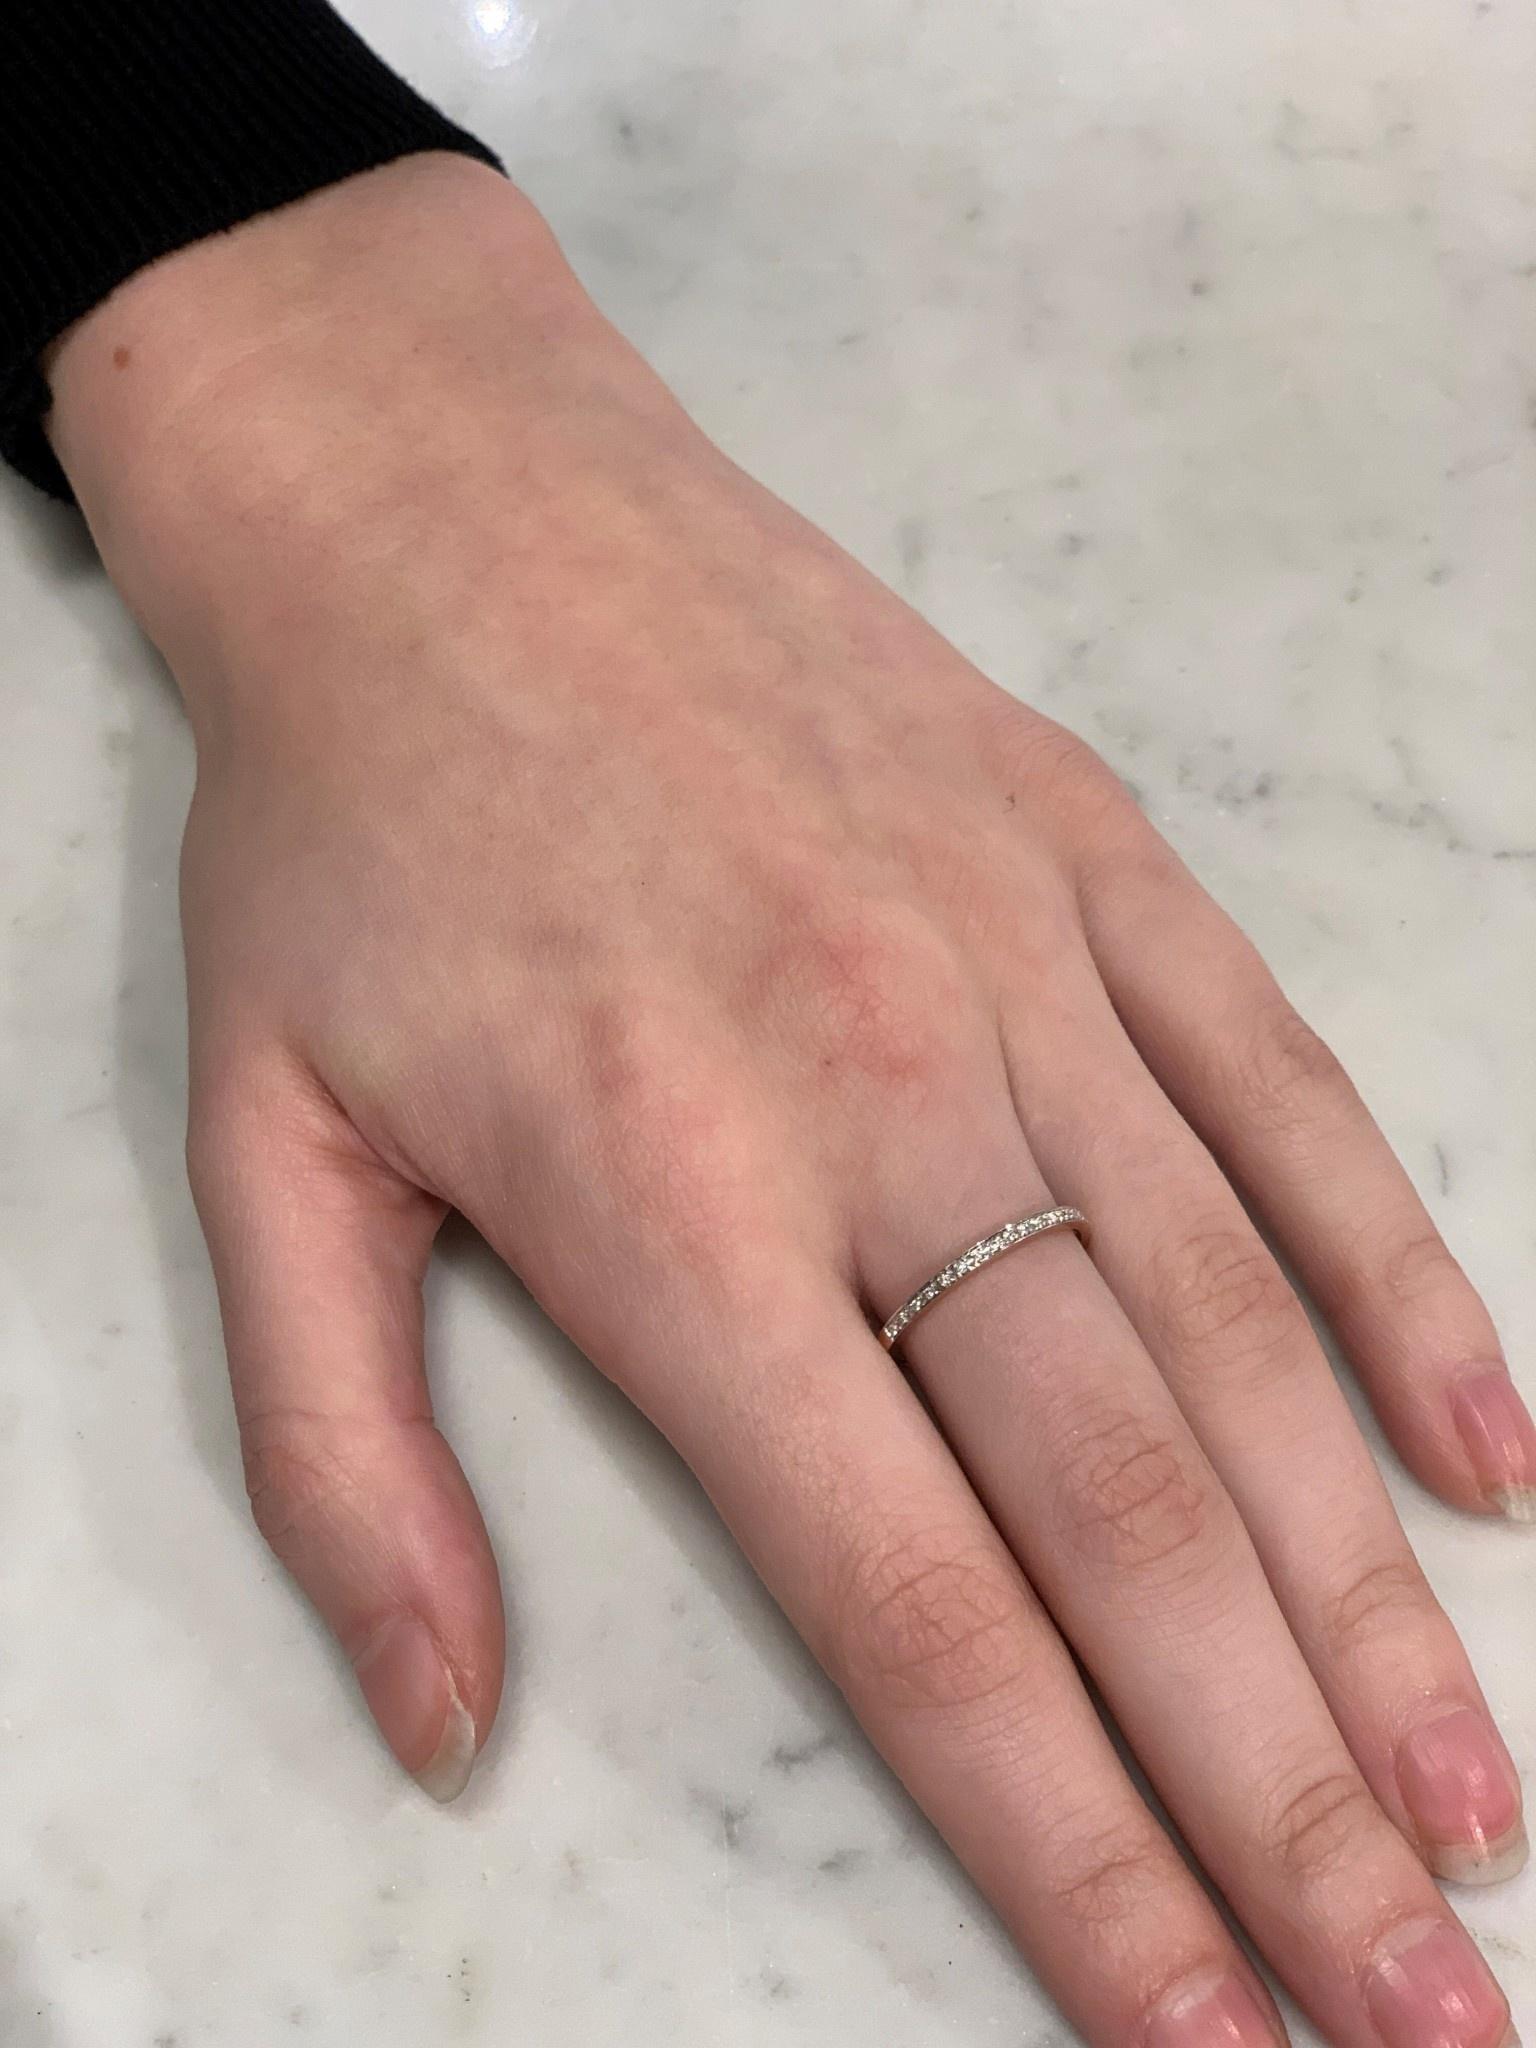 ROEMER ROEMER roségouden ring met briljanten